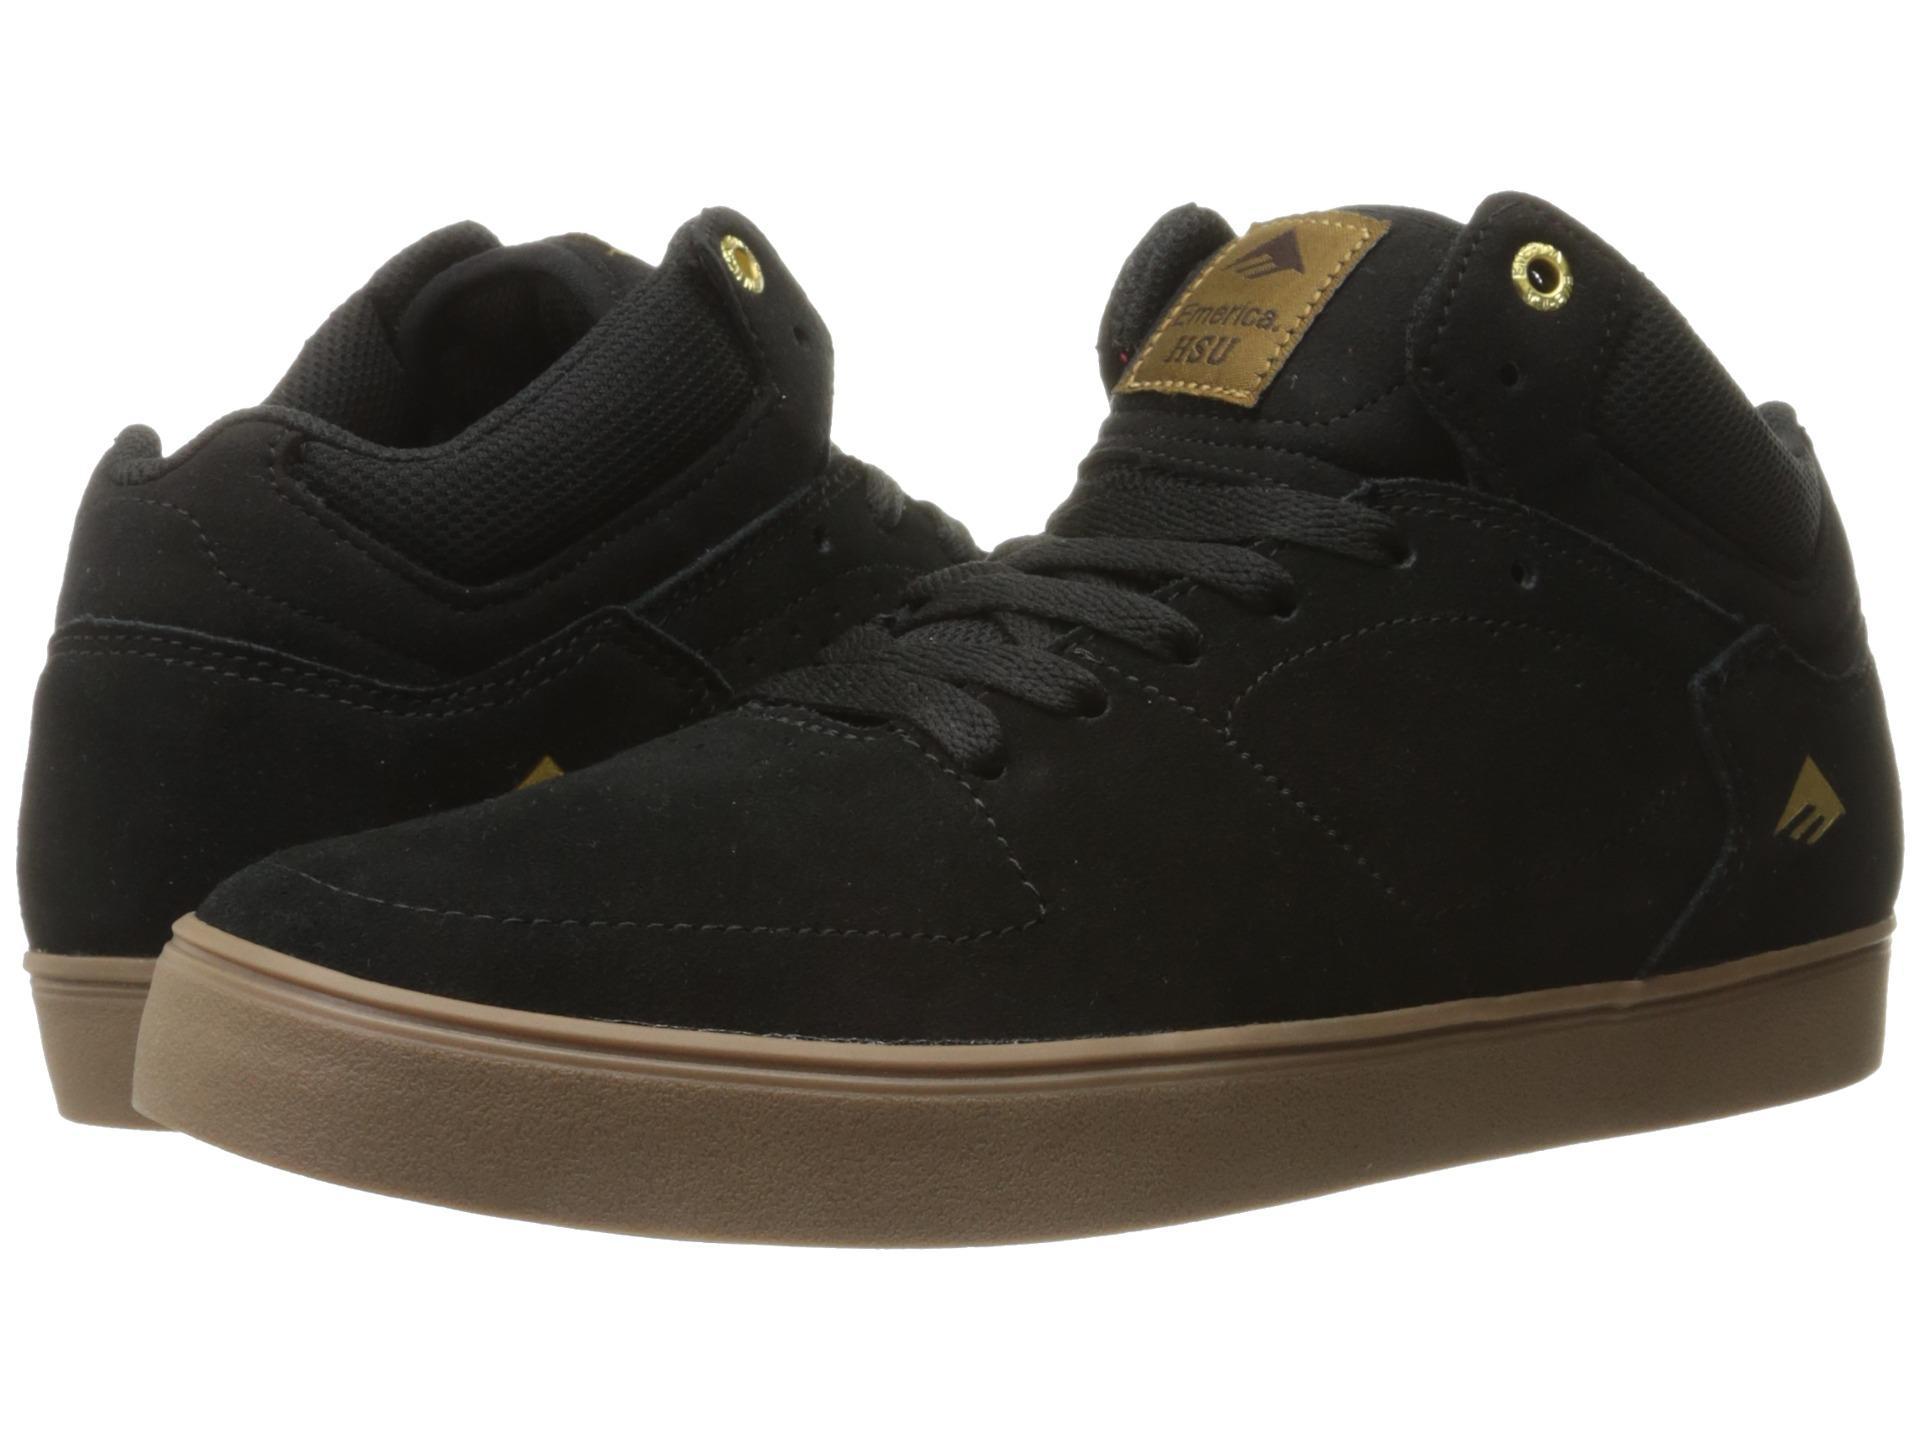 Buy Emerica The Hsu G Shoes